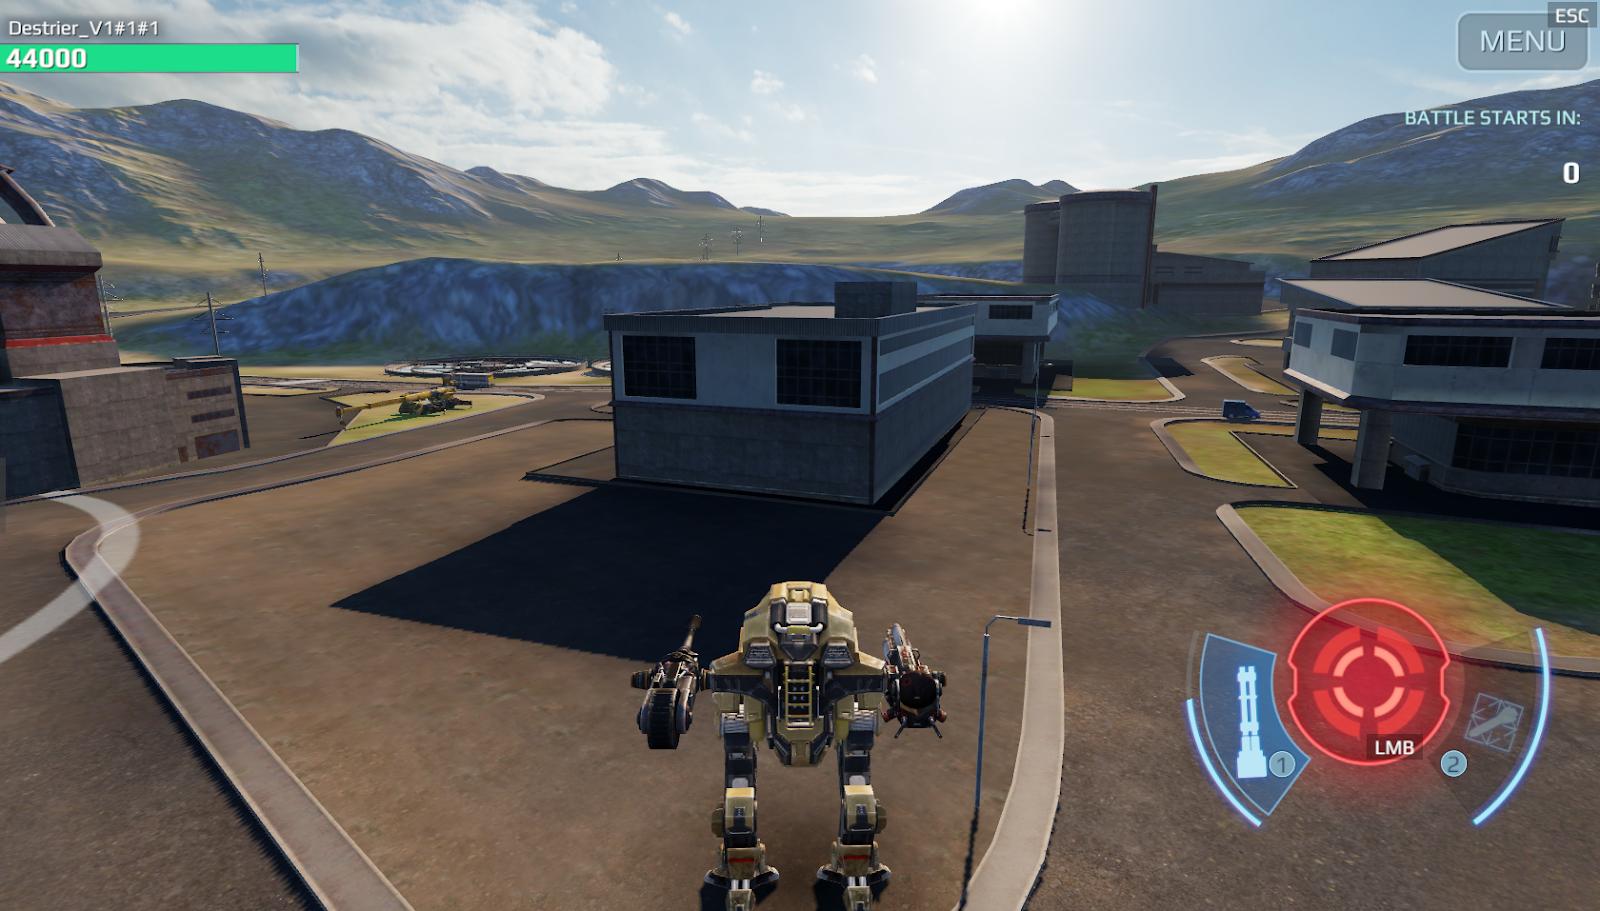 Скриншот с War Robots Remastered, качество Ultra Low